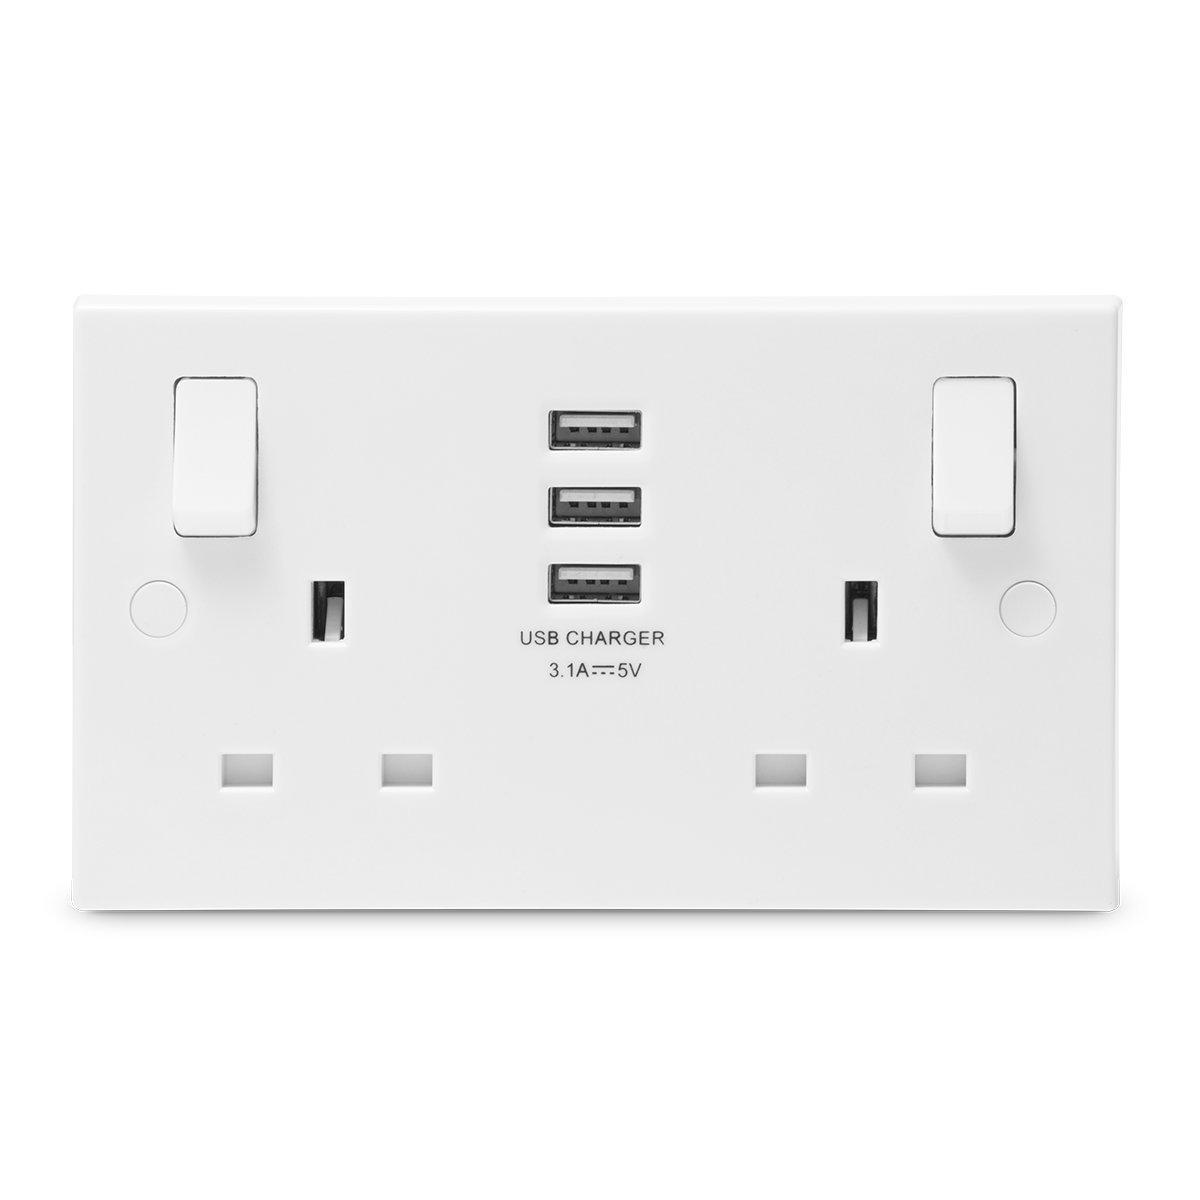 BG Electrical Nexus 922U33 Square Profile Double Switch Socket with 3 x 3.1 A USB White